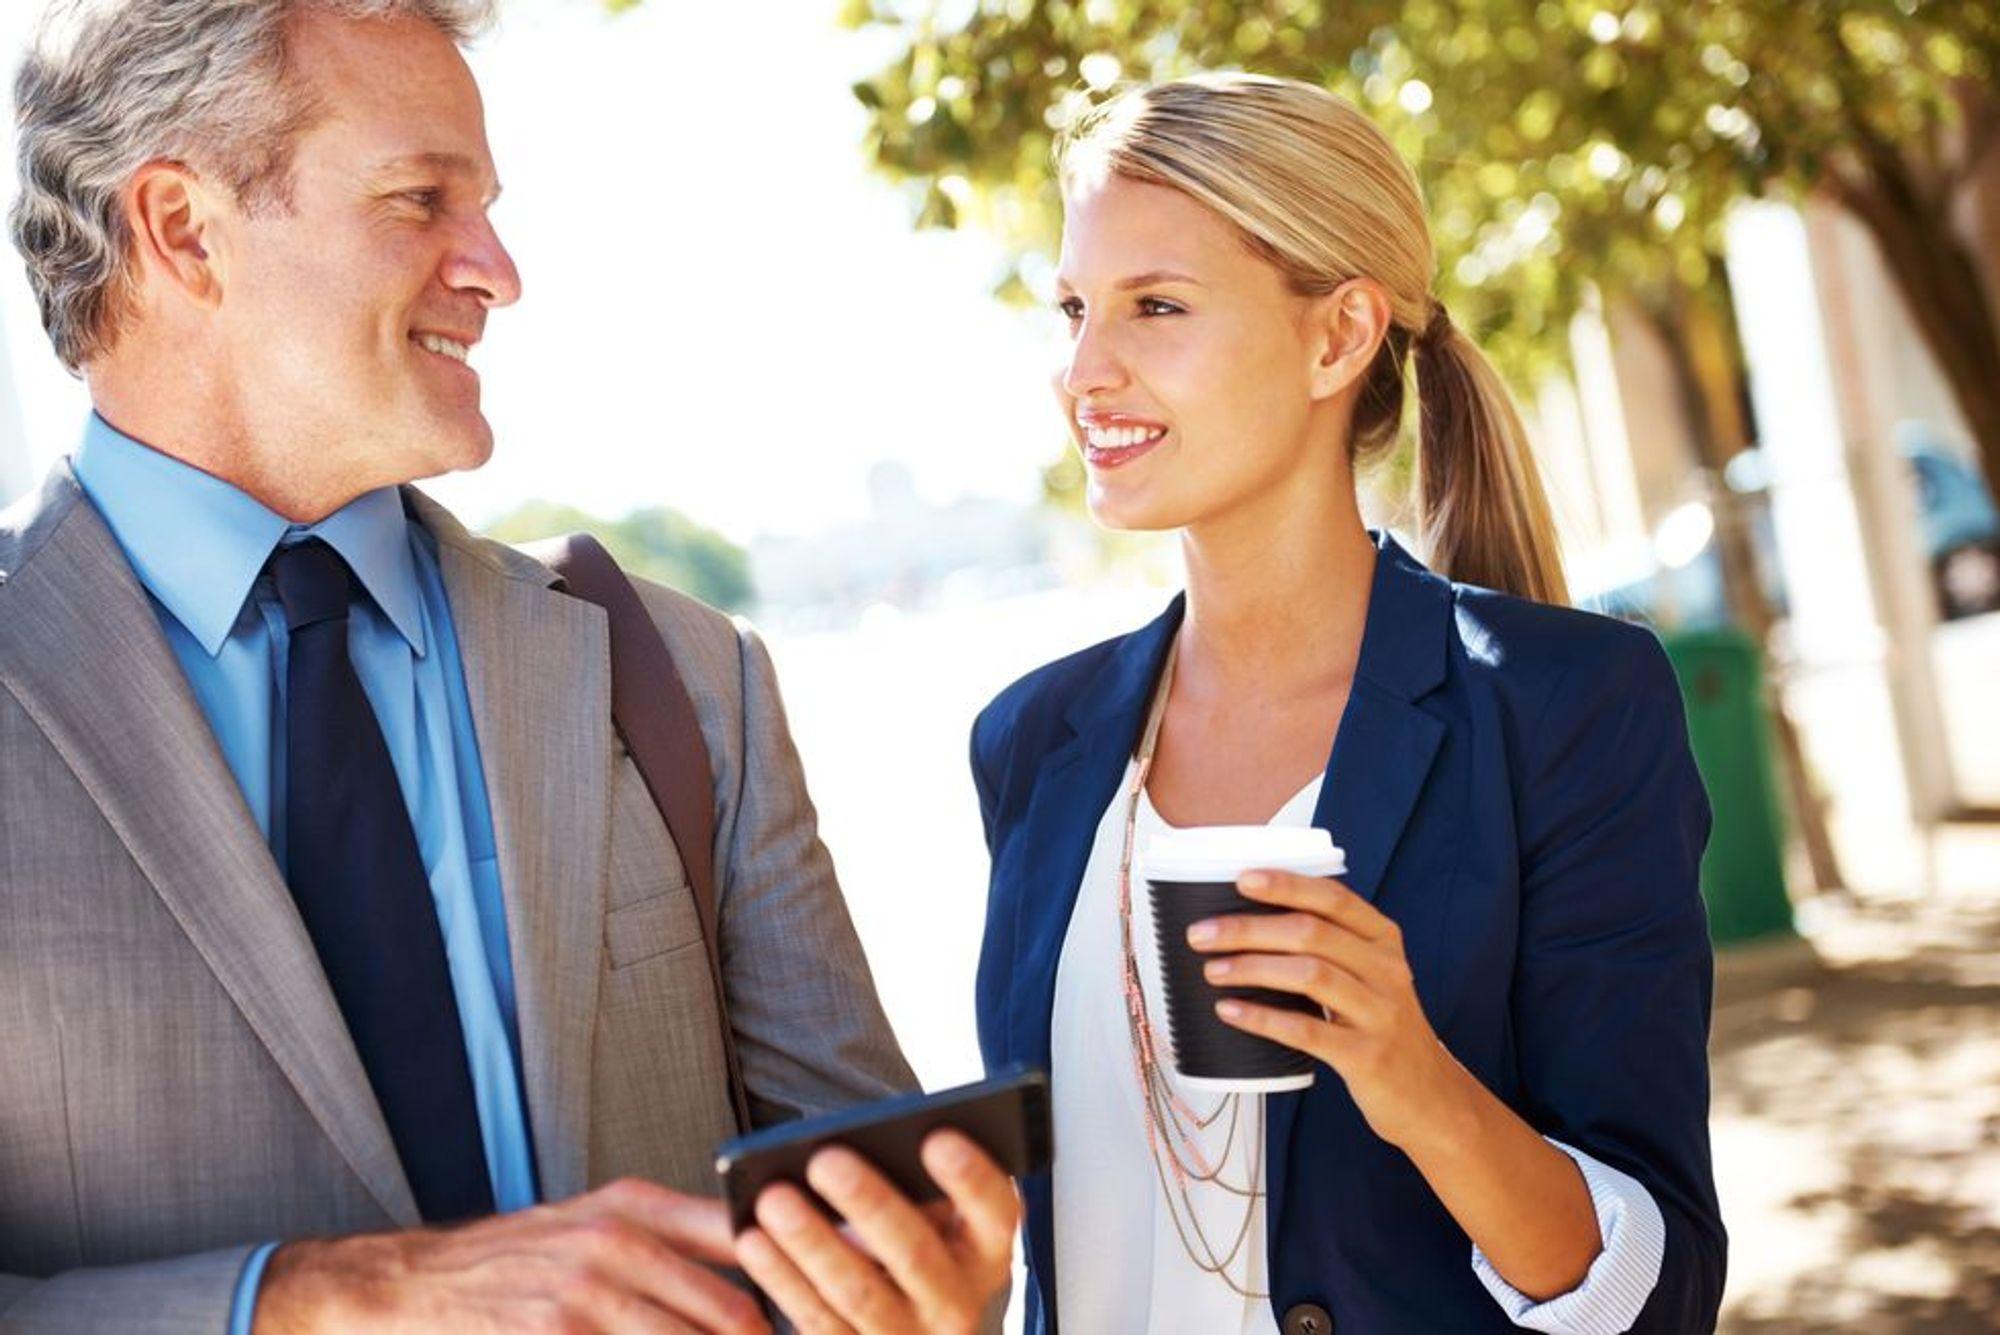 Why Do Older Guys Date Younger Women? - HealthyWomen